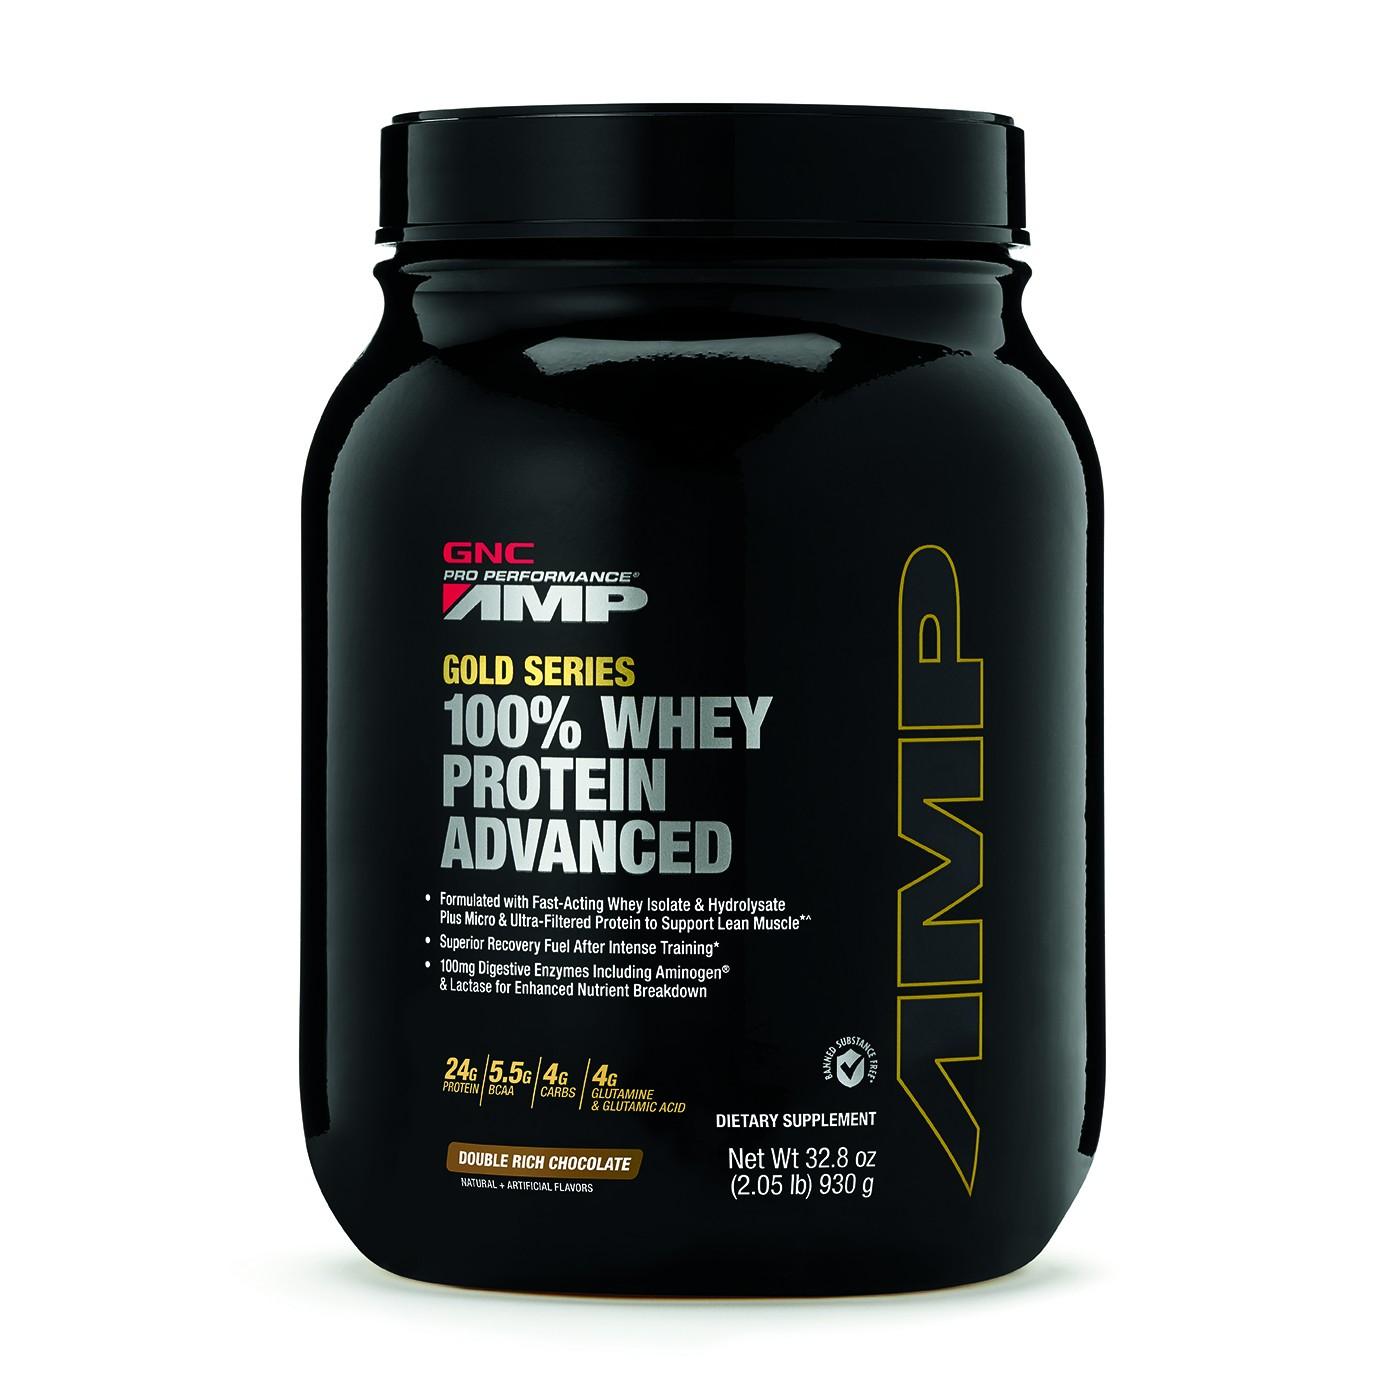 GNC AMP Gold Series 100% Whey Protein Advanced, Proteina din Zer, cu Aroma de Ciocolata, 930 g